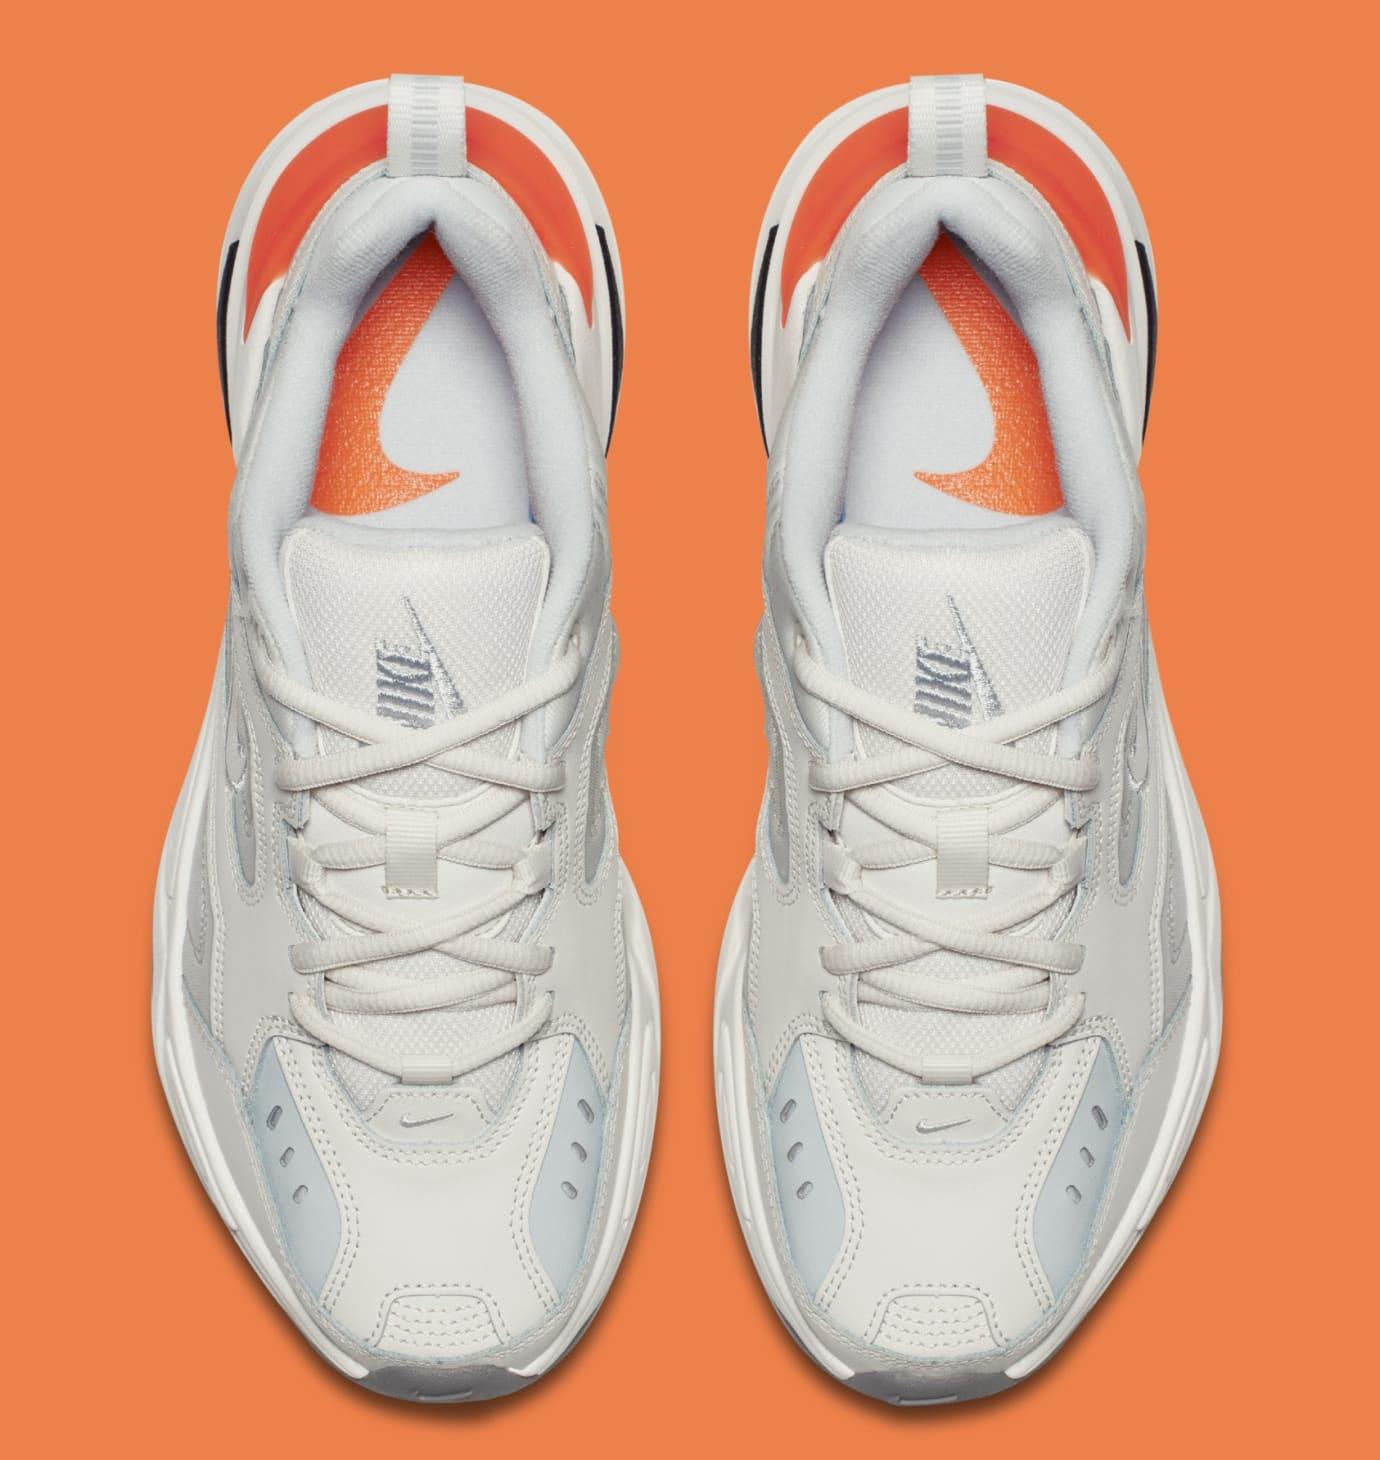 638c45ce23 Image via Nike Nike M2K Tekno WMNS 'Phantom/Oil Grey/Matte Silver/Hyper  Crimson'